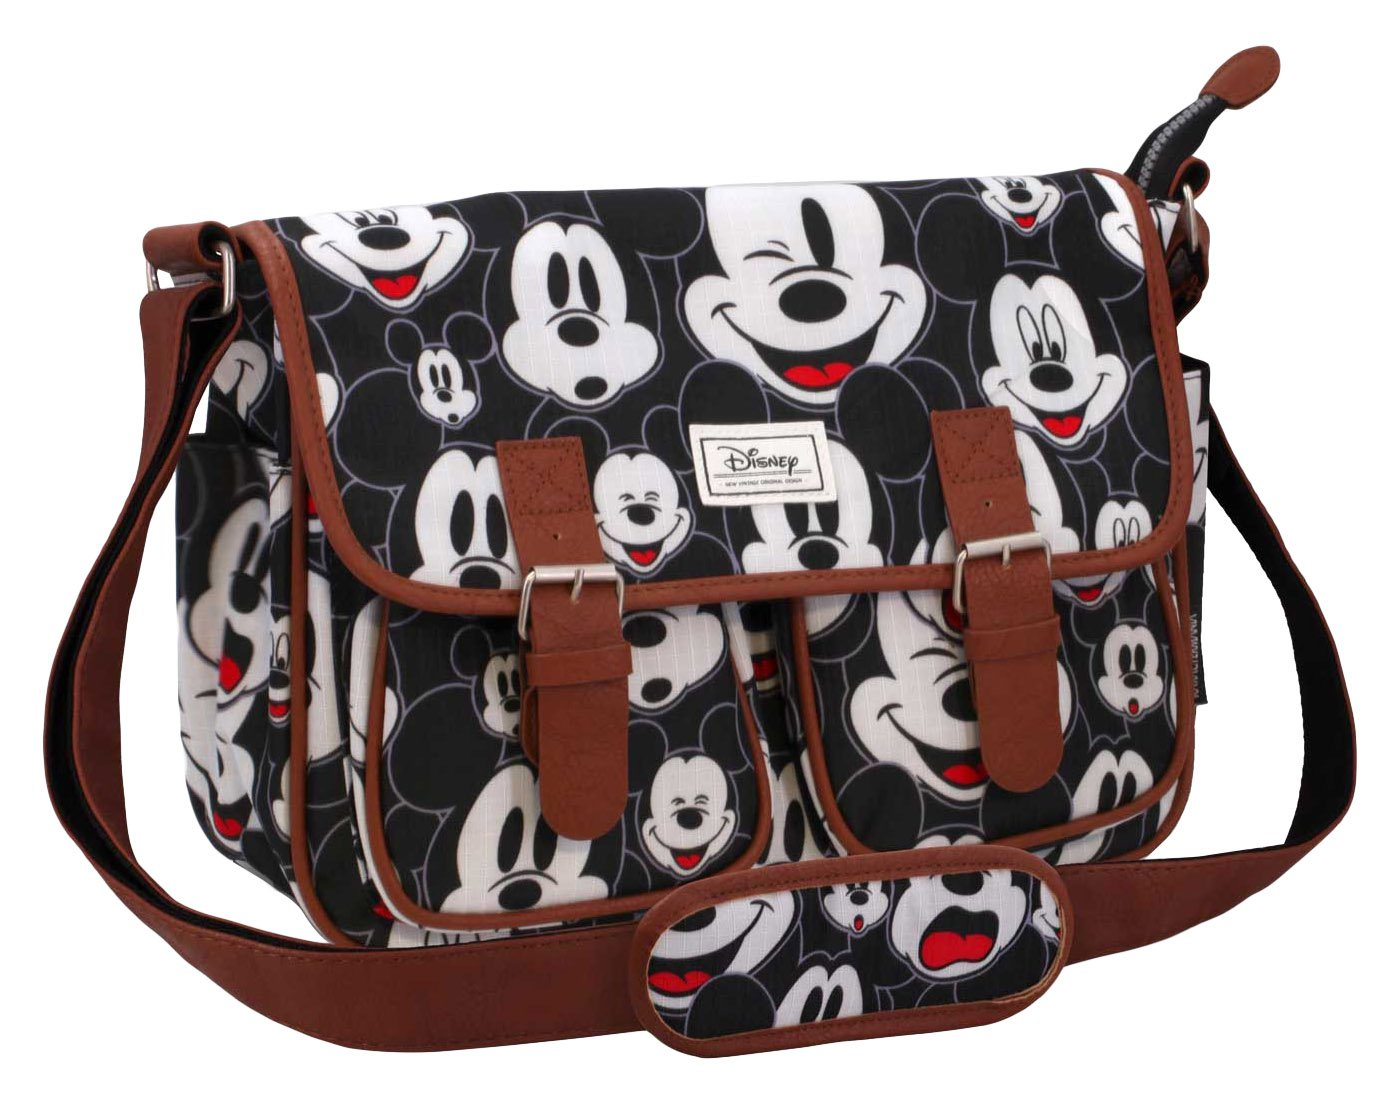 Disney Classic Mickey Visages Umhängetasche, 34 cm, Schwarz (Negro) Karactermania 36382